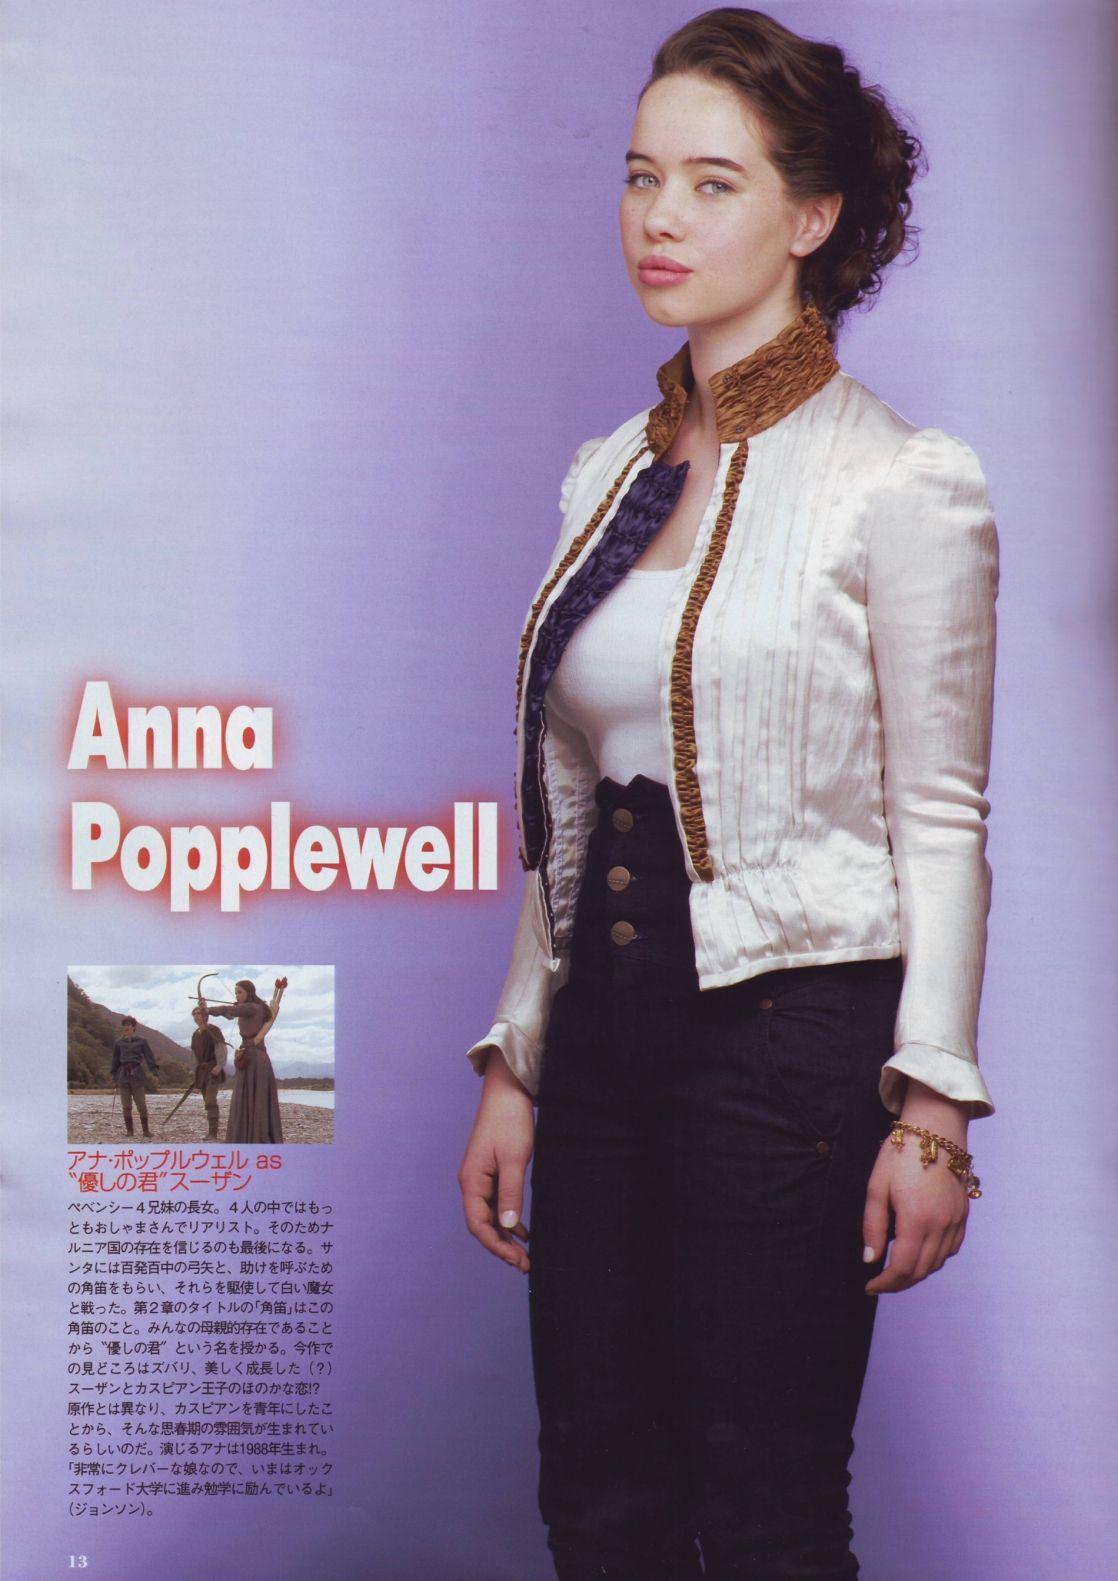 anna popplewell imdb